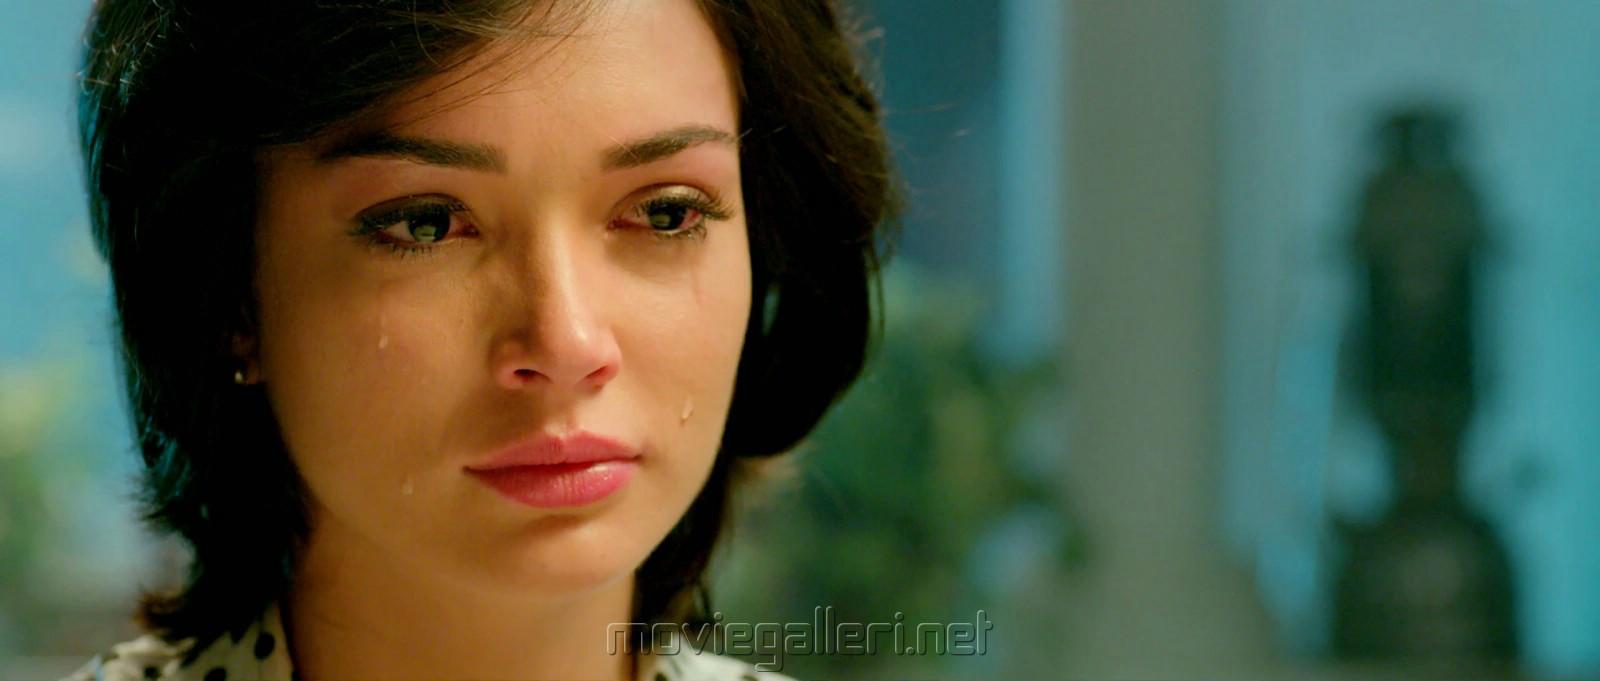 Theri Movie Stills | Theri Movie Latest Stills | New Movie ...